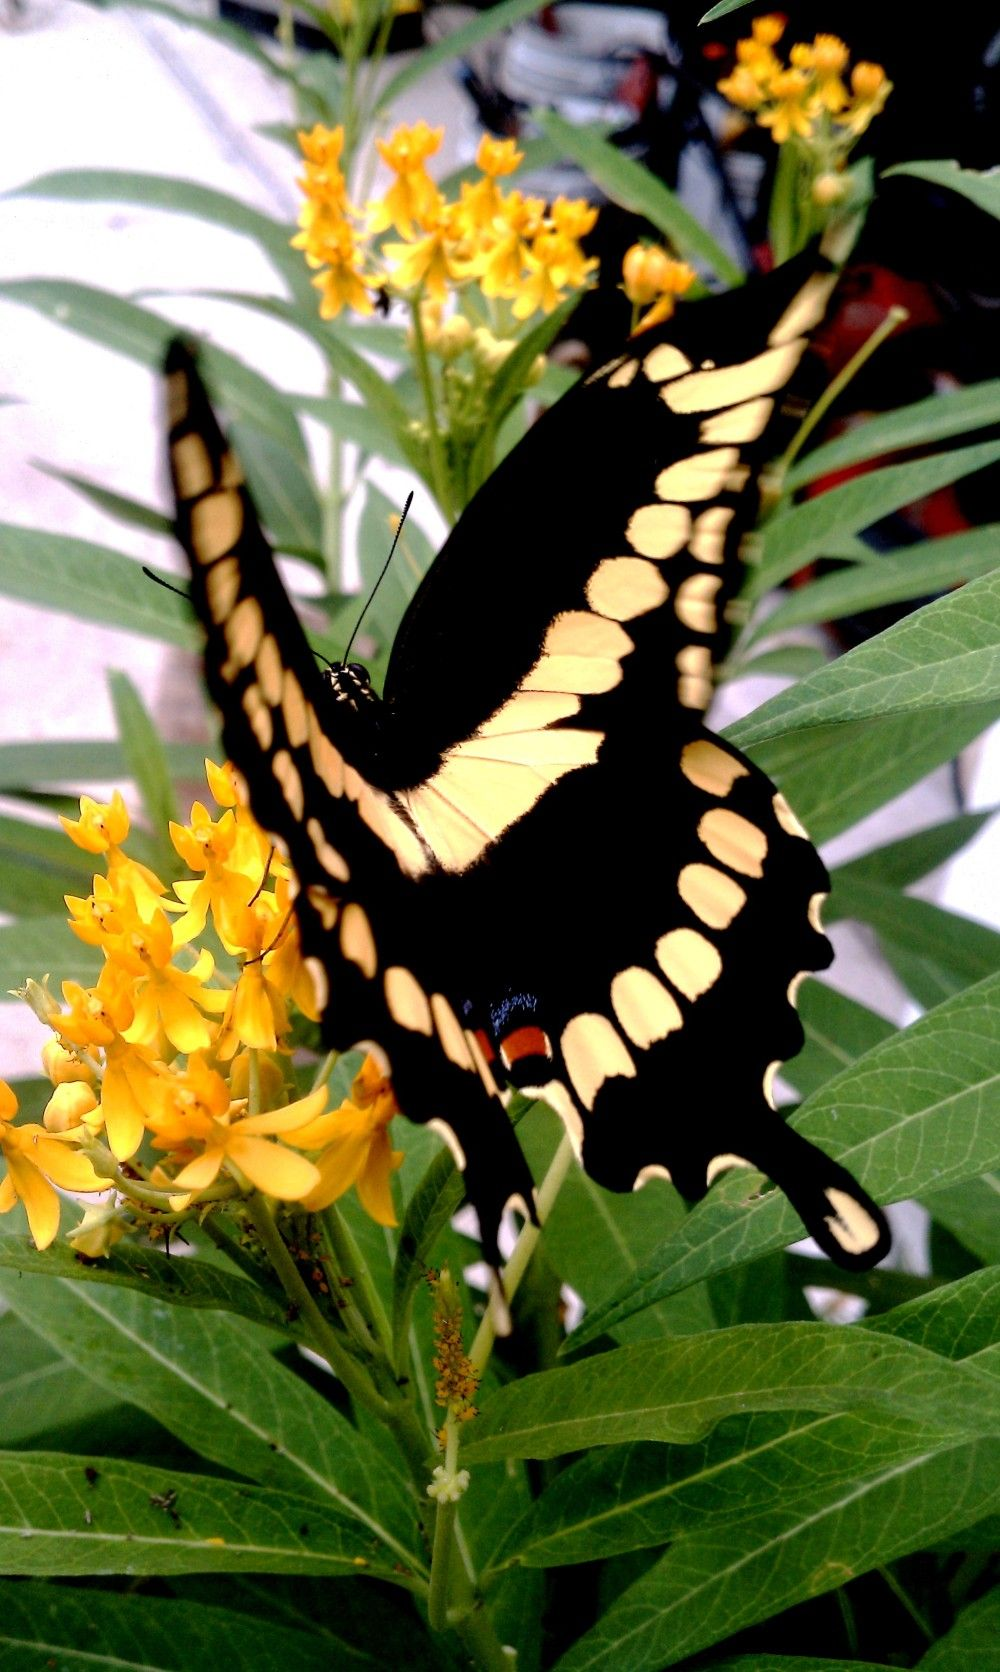 Butterfly 2011 by Kimmy Van Kooten- Photos 2.0 - Creative Thinkers International